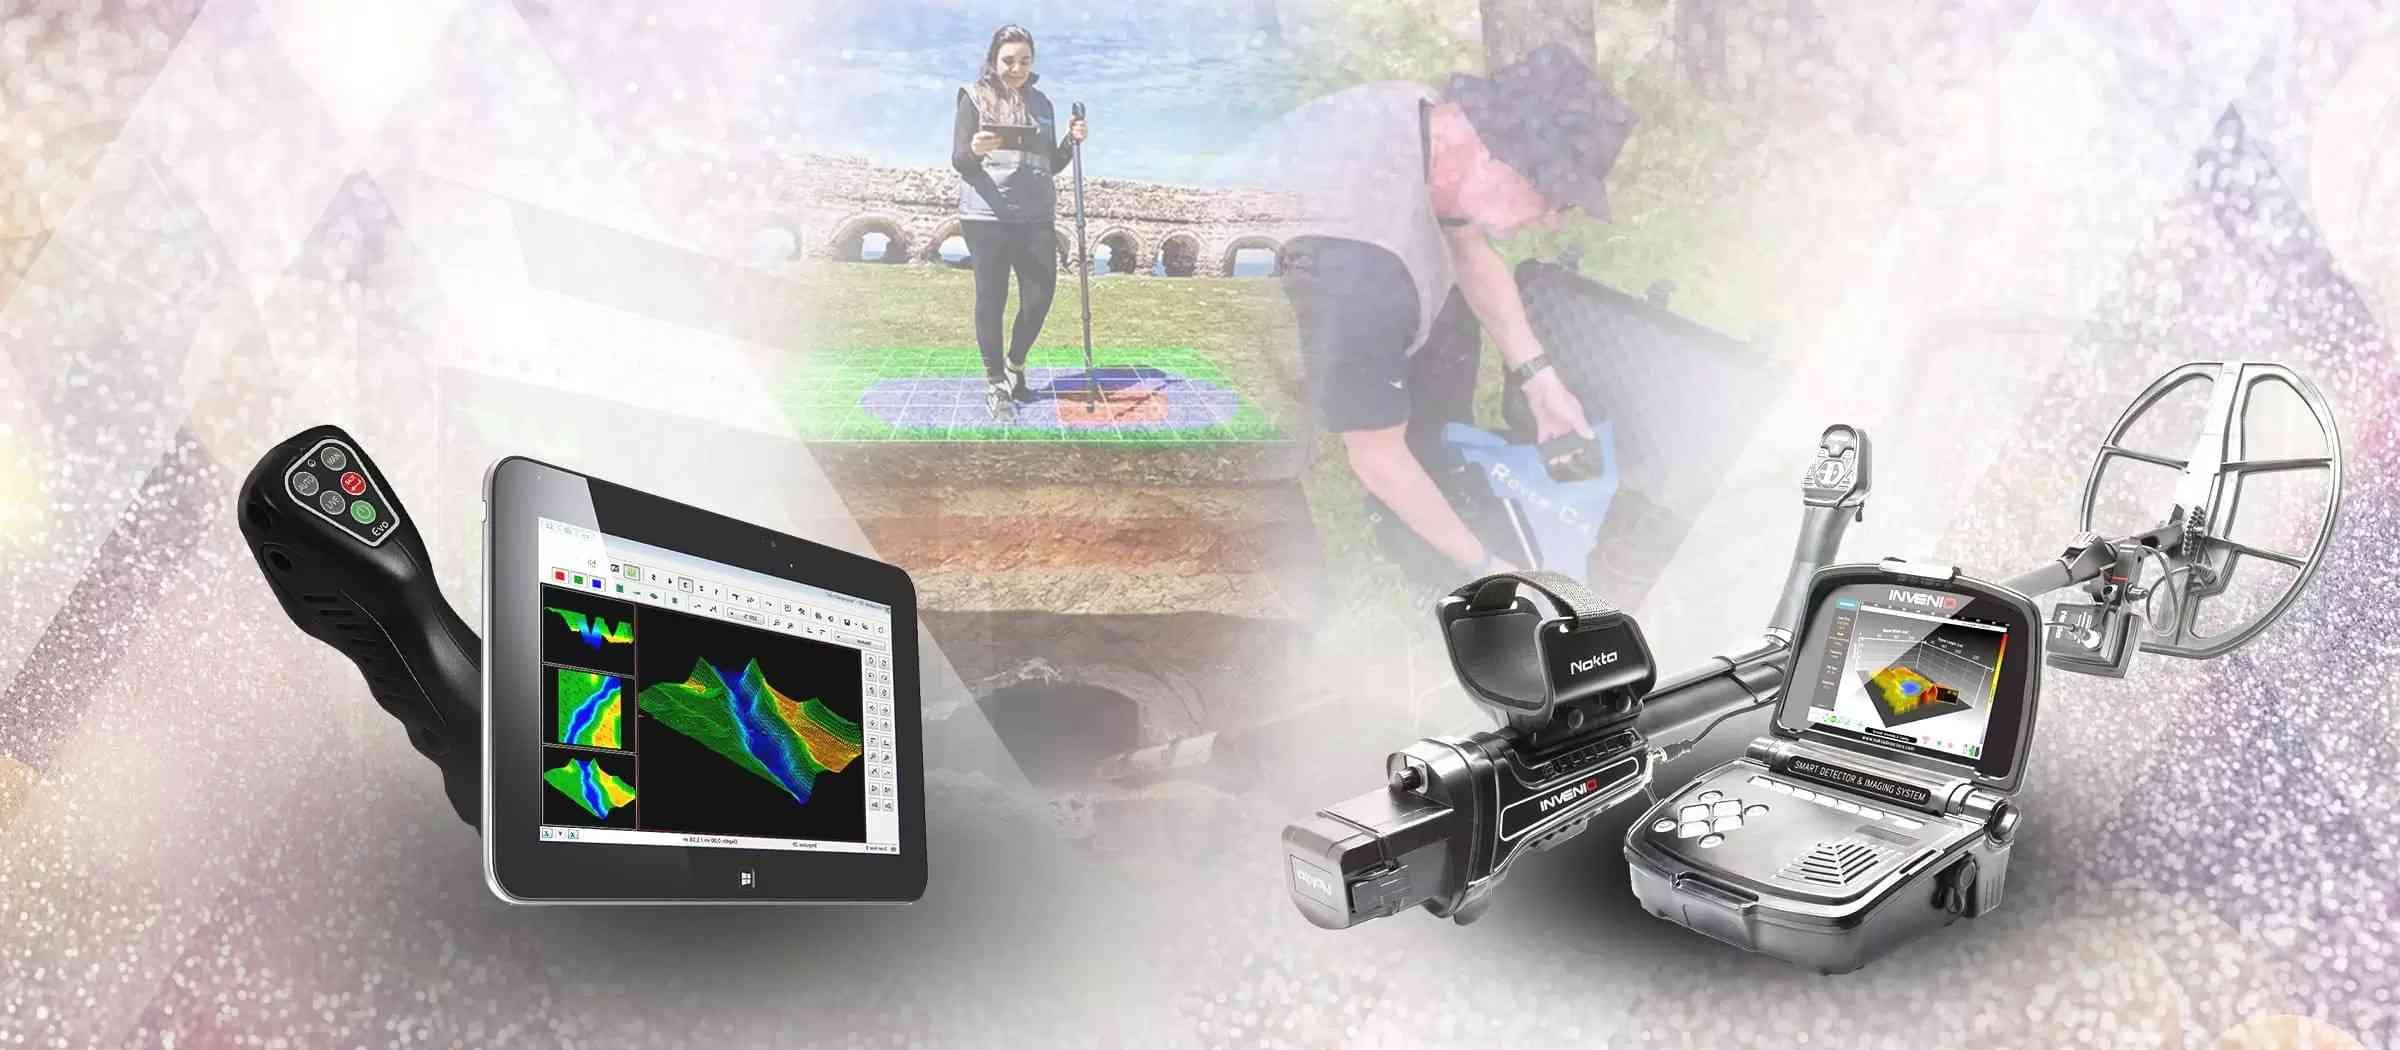 Imaging-System-Detectors